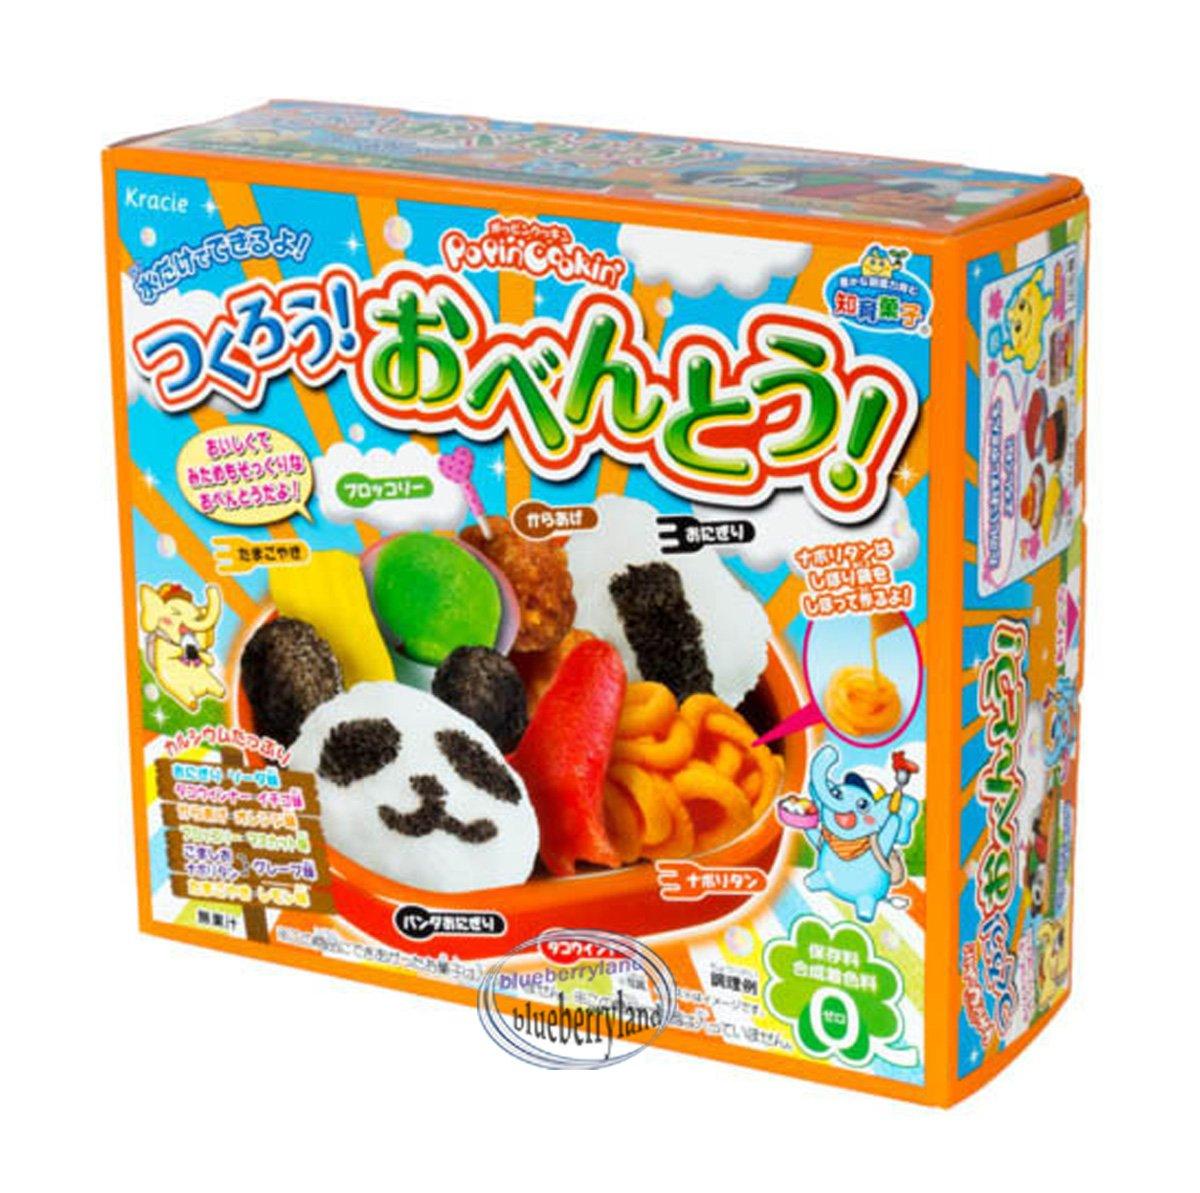 japan kracie bento lunch box diy candy kit happy kitchen snack sweet. Black Bedroom Furniture Sets. Home Design Ideas